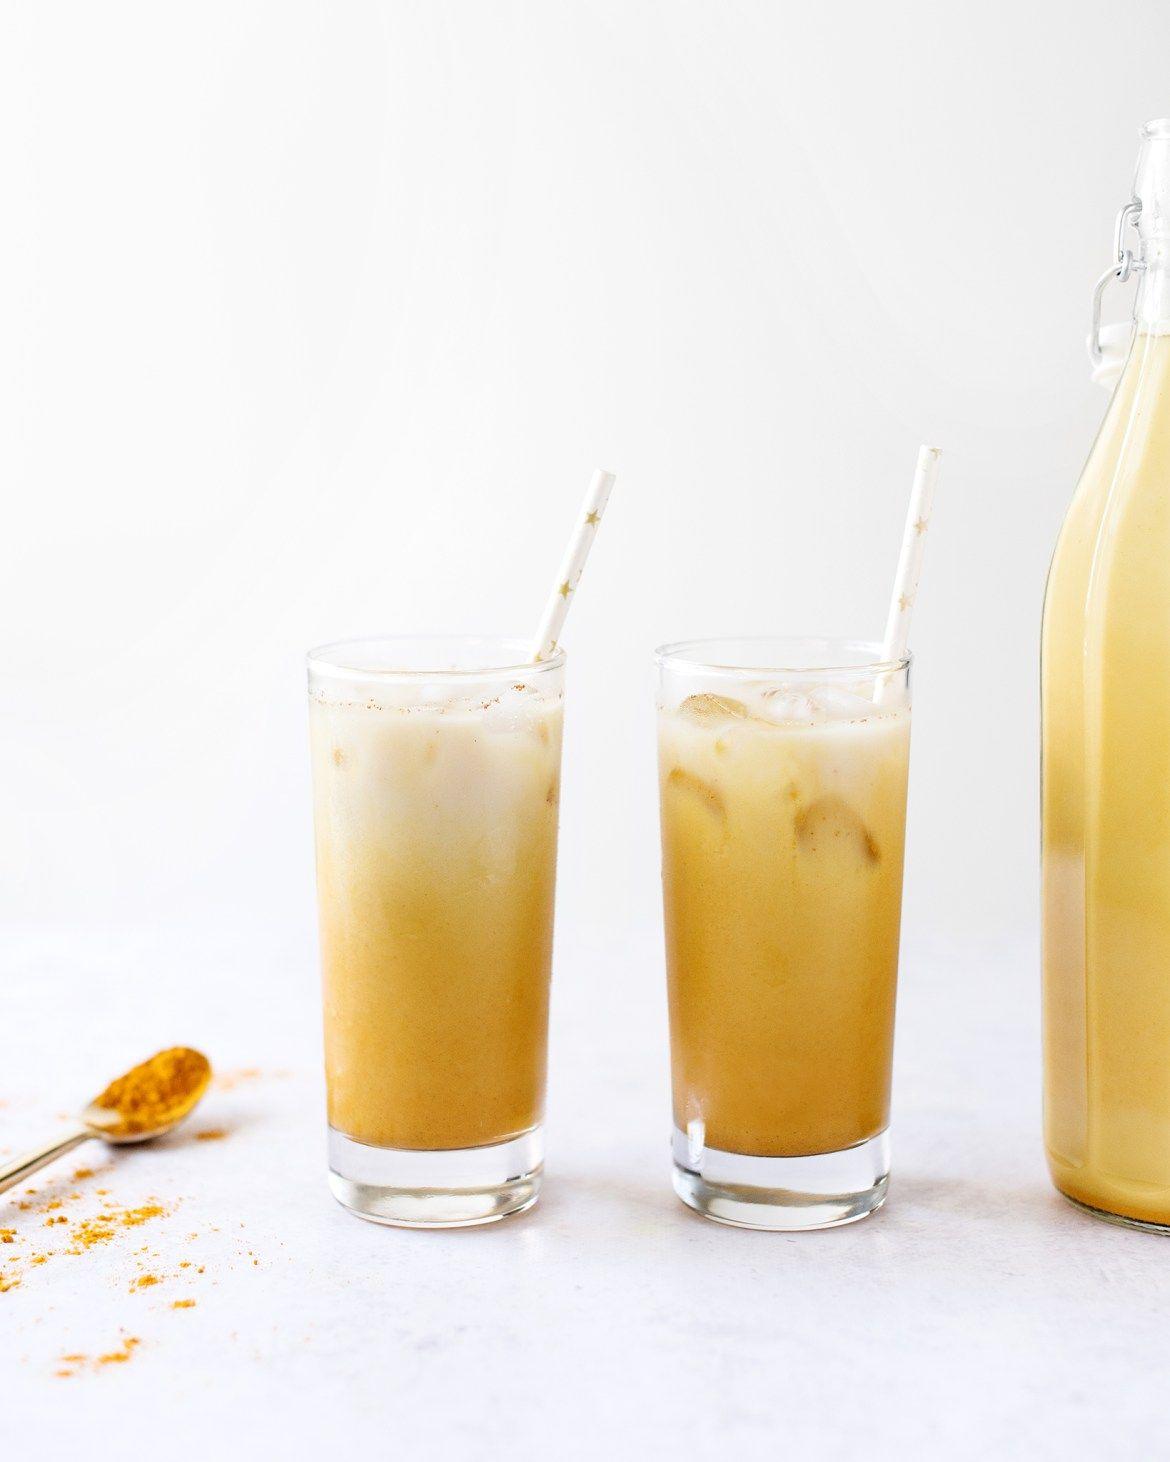 Iced Golden Turmeric Latte